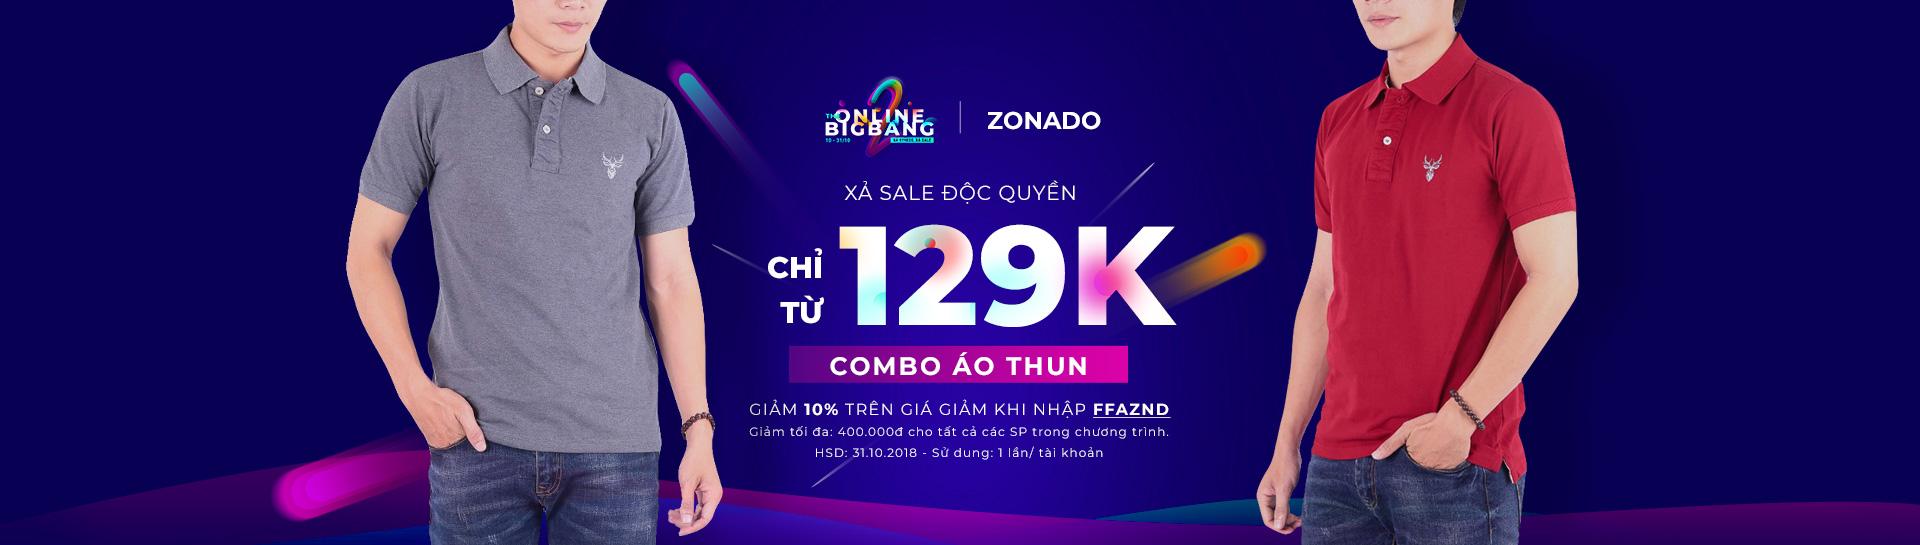 Zonado - Thời trang nam chỉ từ 99K